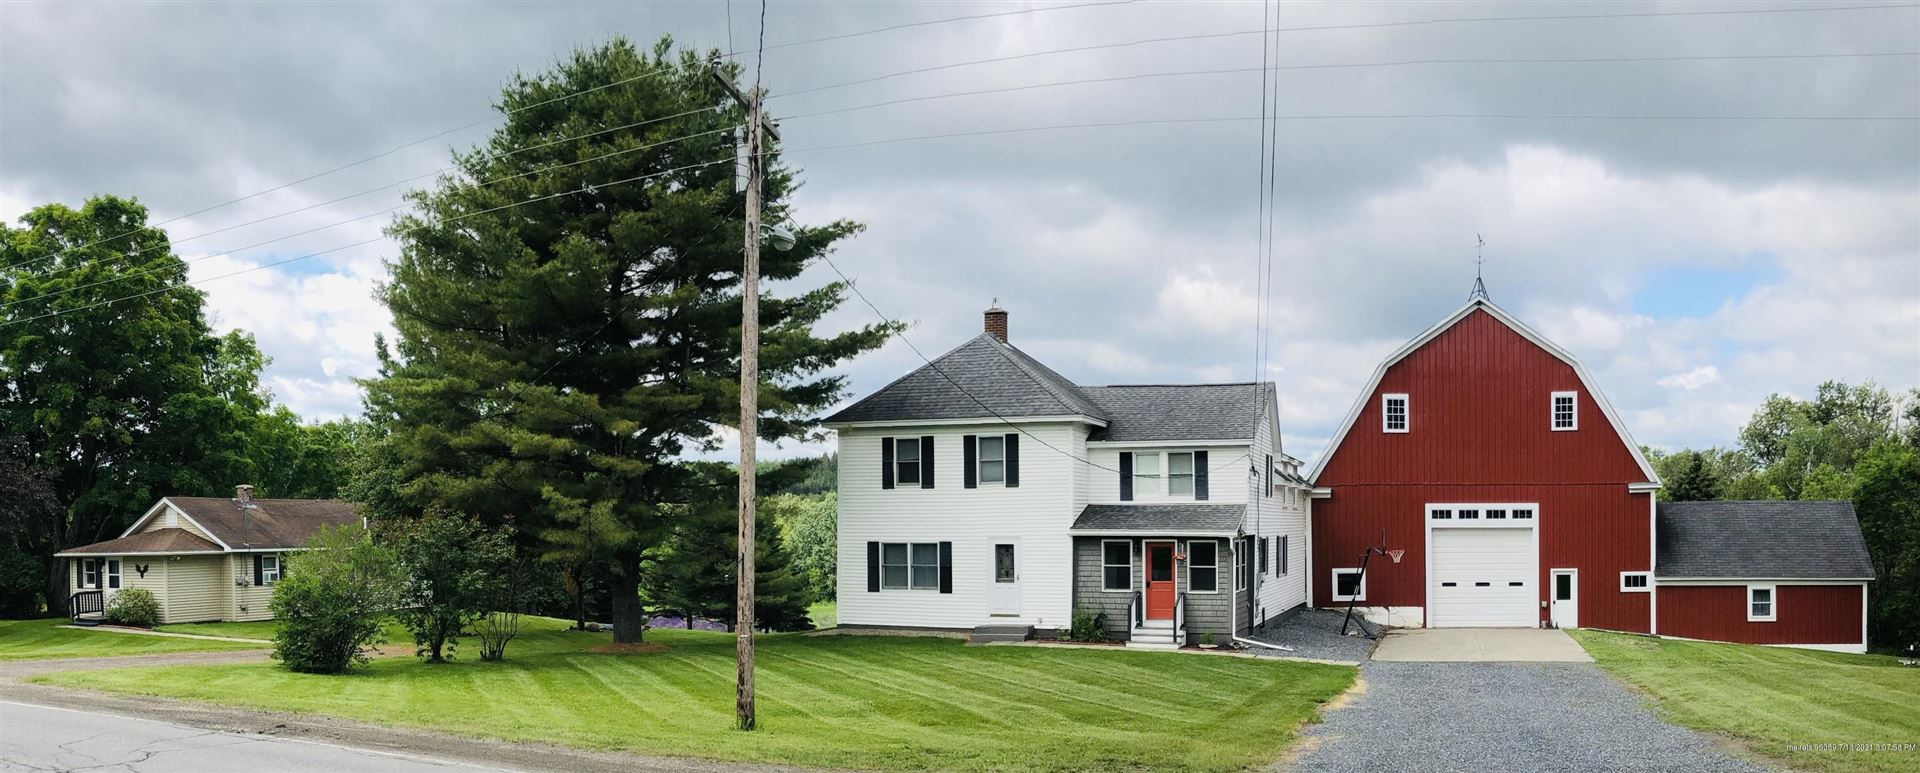 Photo of 252 Parkhurst Siding Road, Presque Isle, ME 04769 (MLS # 1499492)